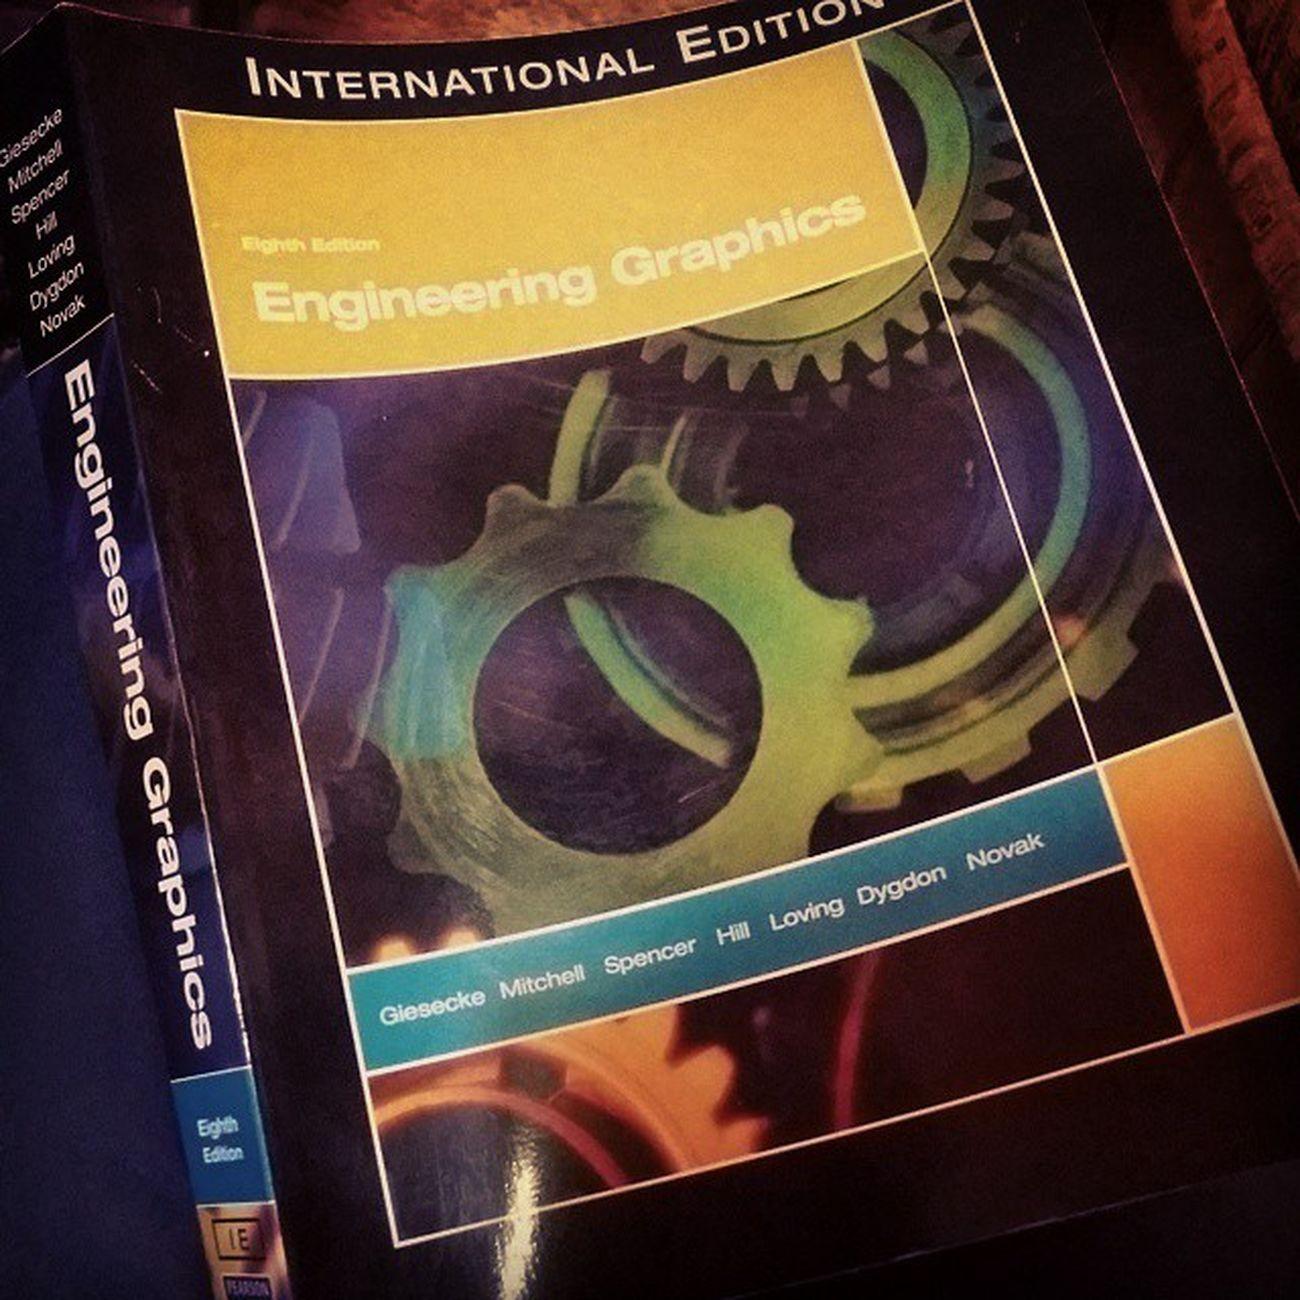 Engineering Graphics ... for Eighth_edition تحفة من تحف الزمن .. أخيراً فى ارض الوطن بمكتبتى